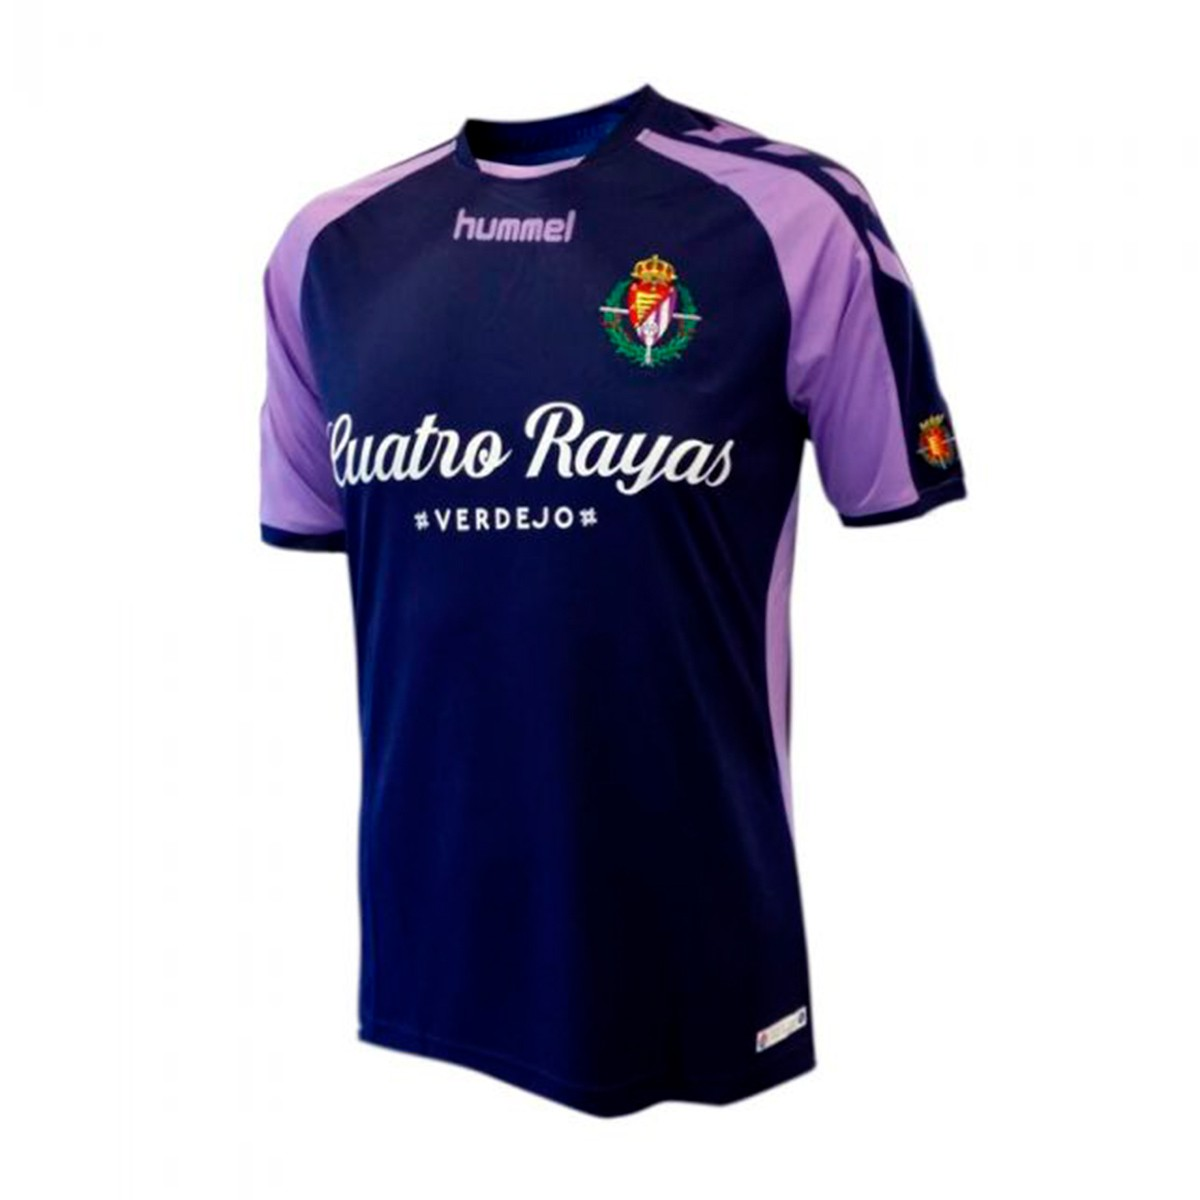 Hummel Real Valladolid CF 2018-2019 Away Jersey